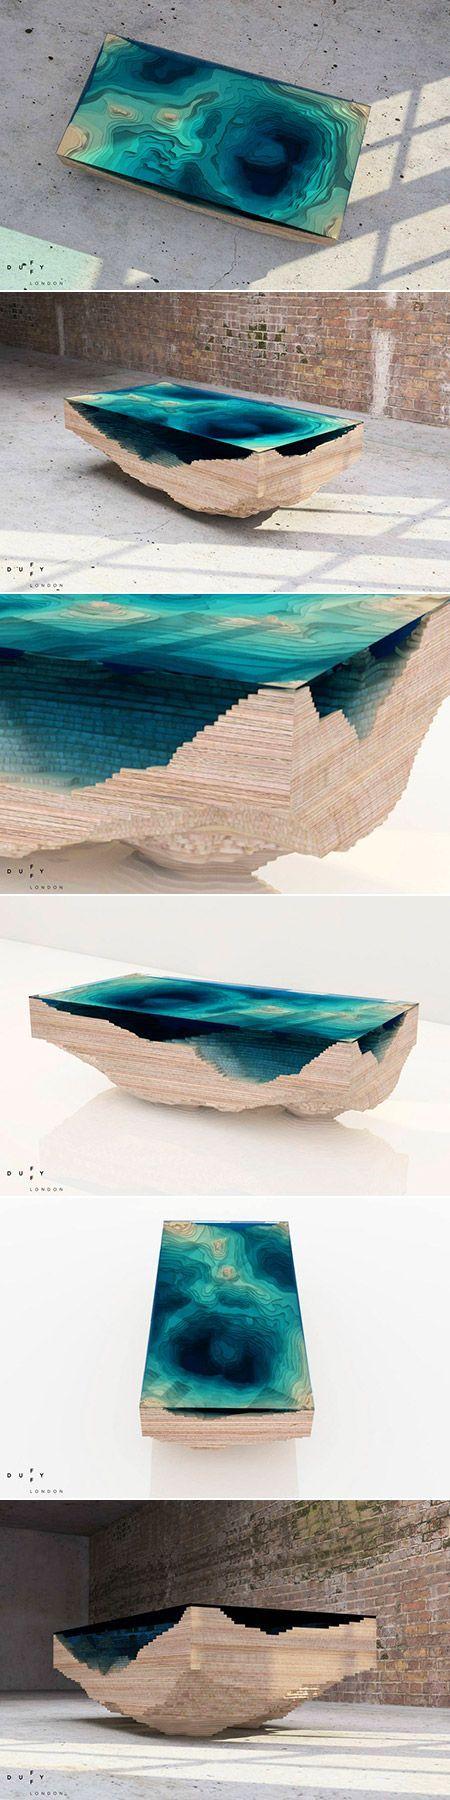 Interessantes aus Glas: